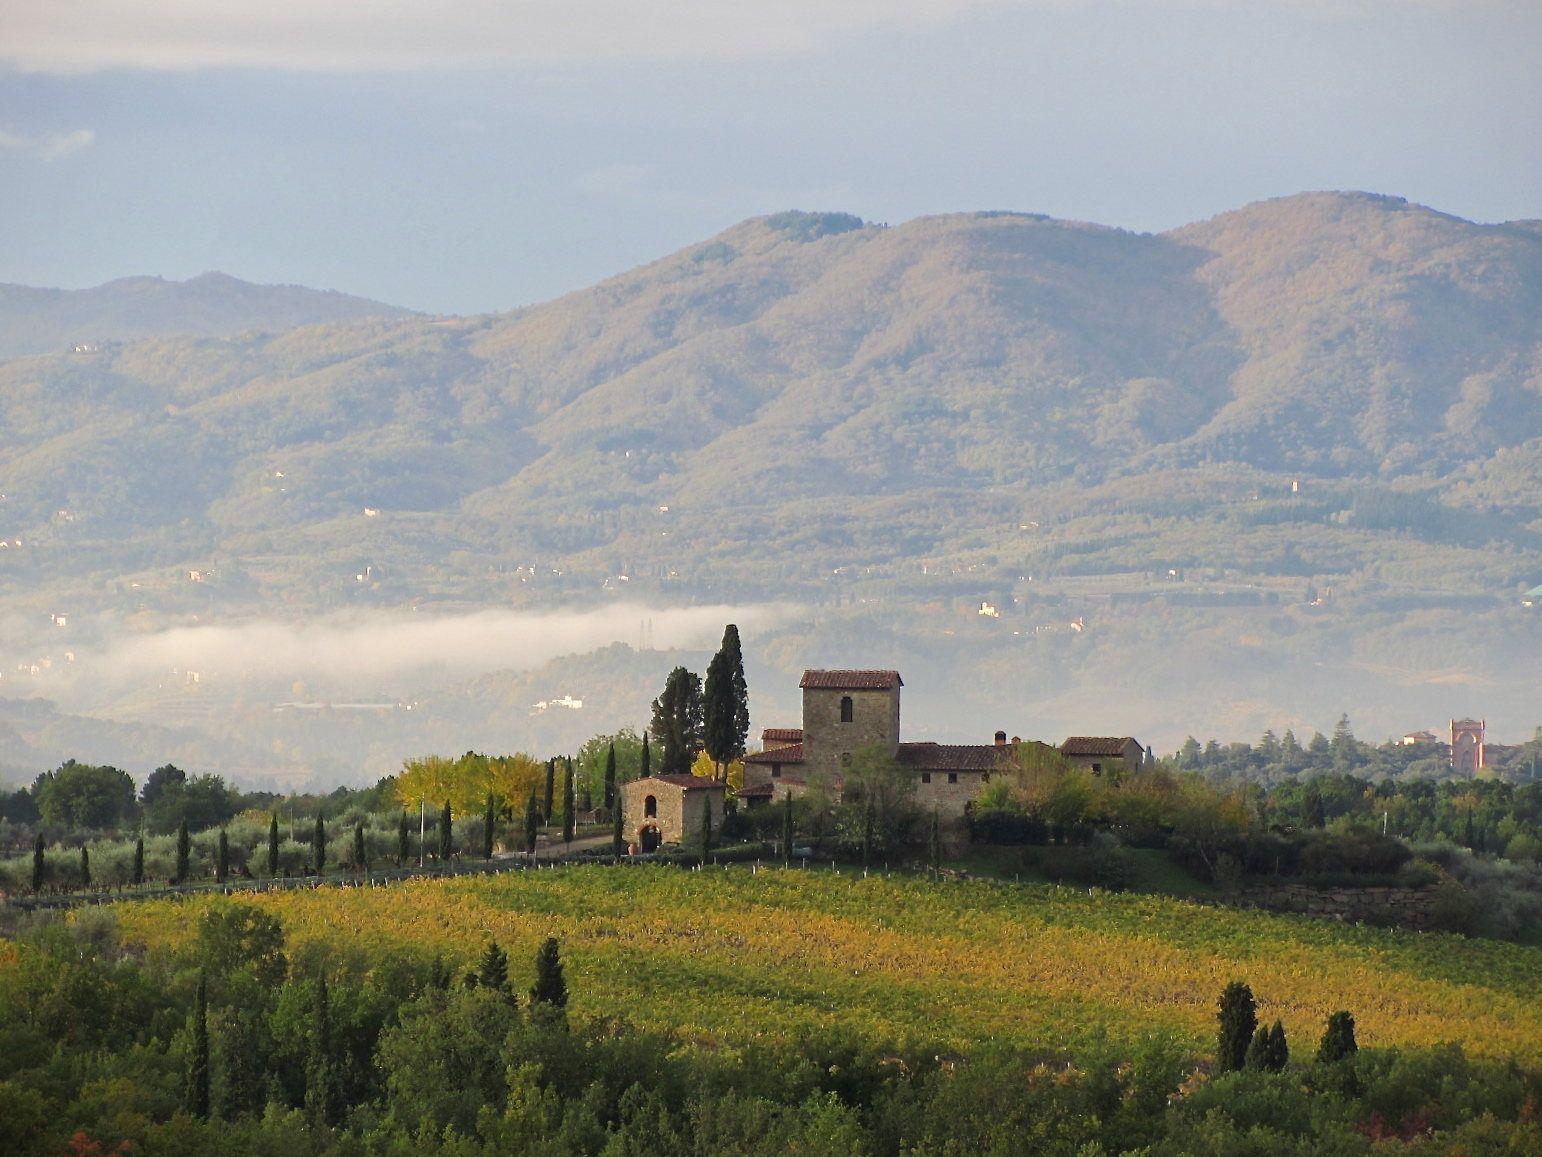 Tuscany country by Giuseppe Atzeni on 500px